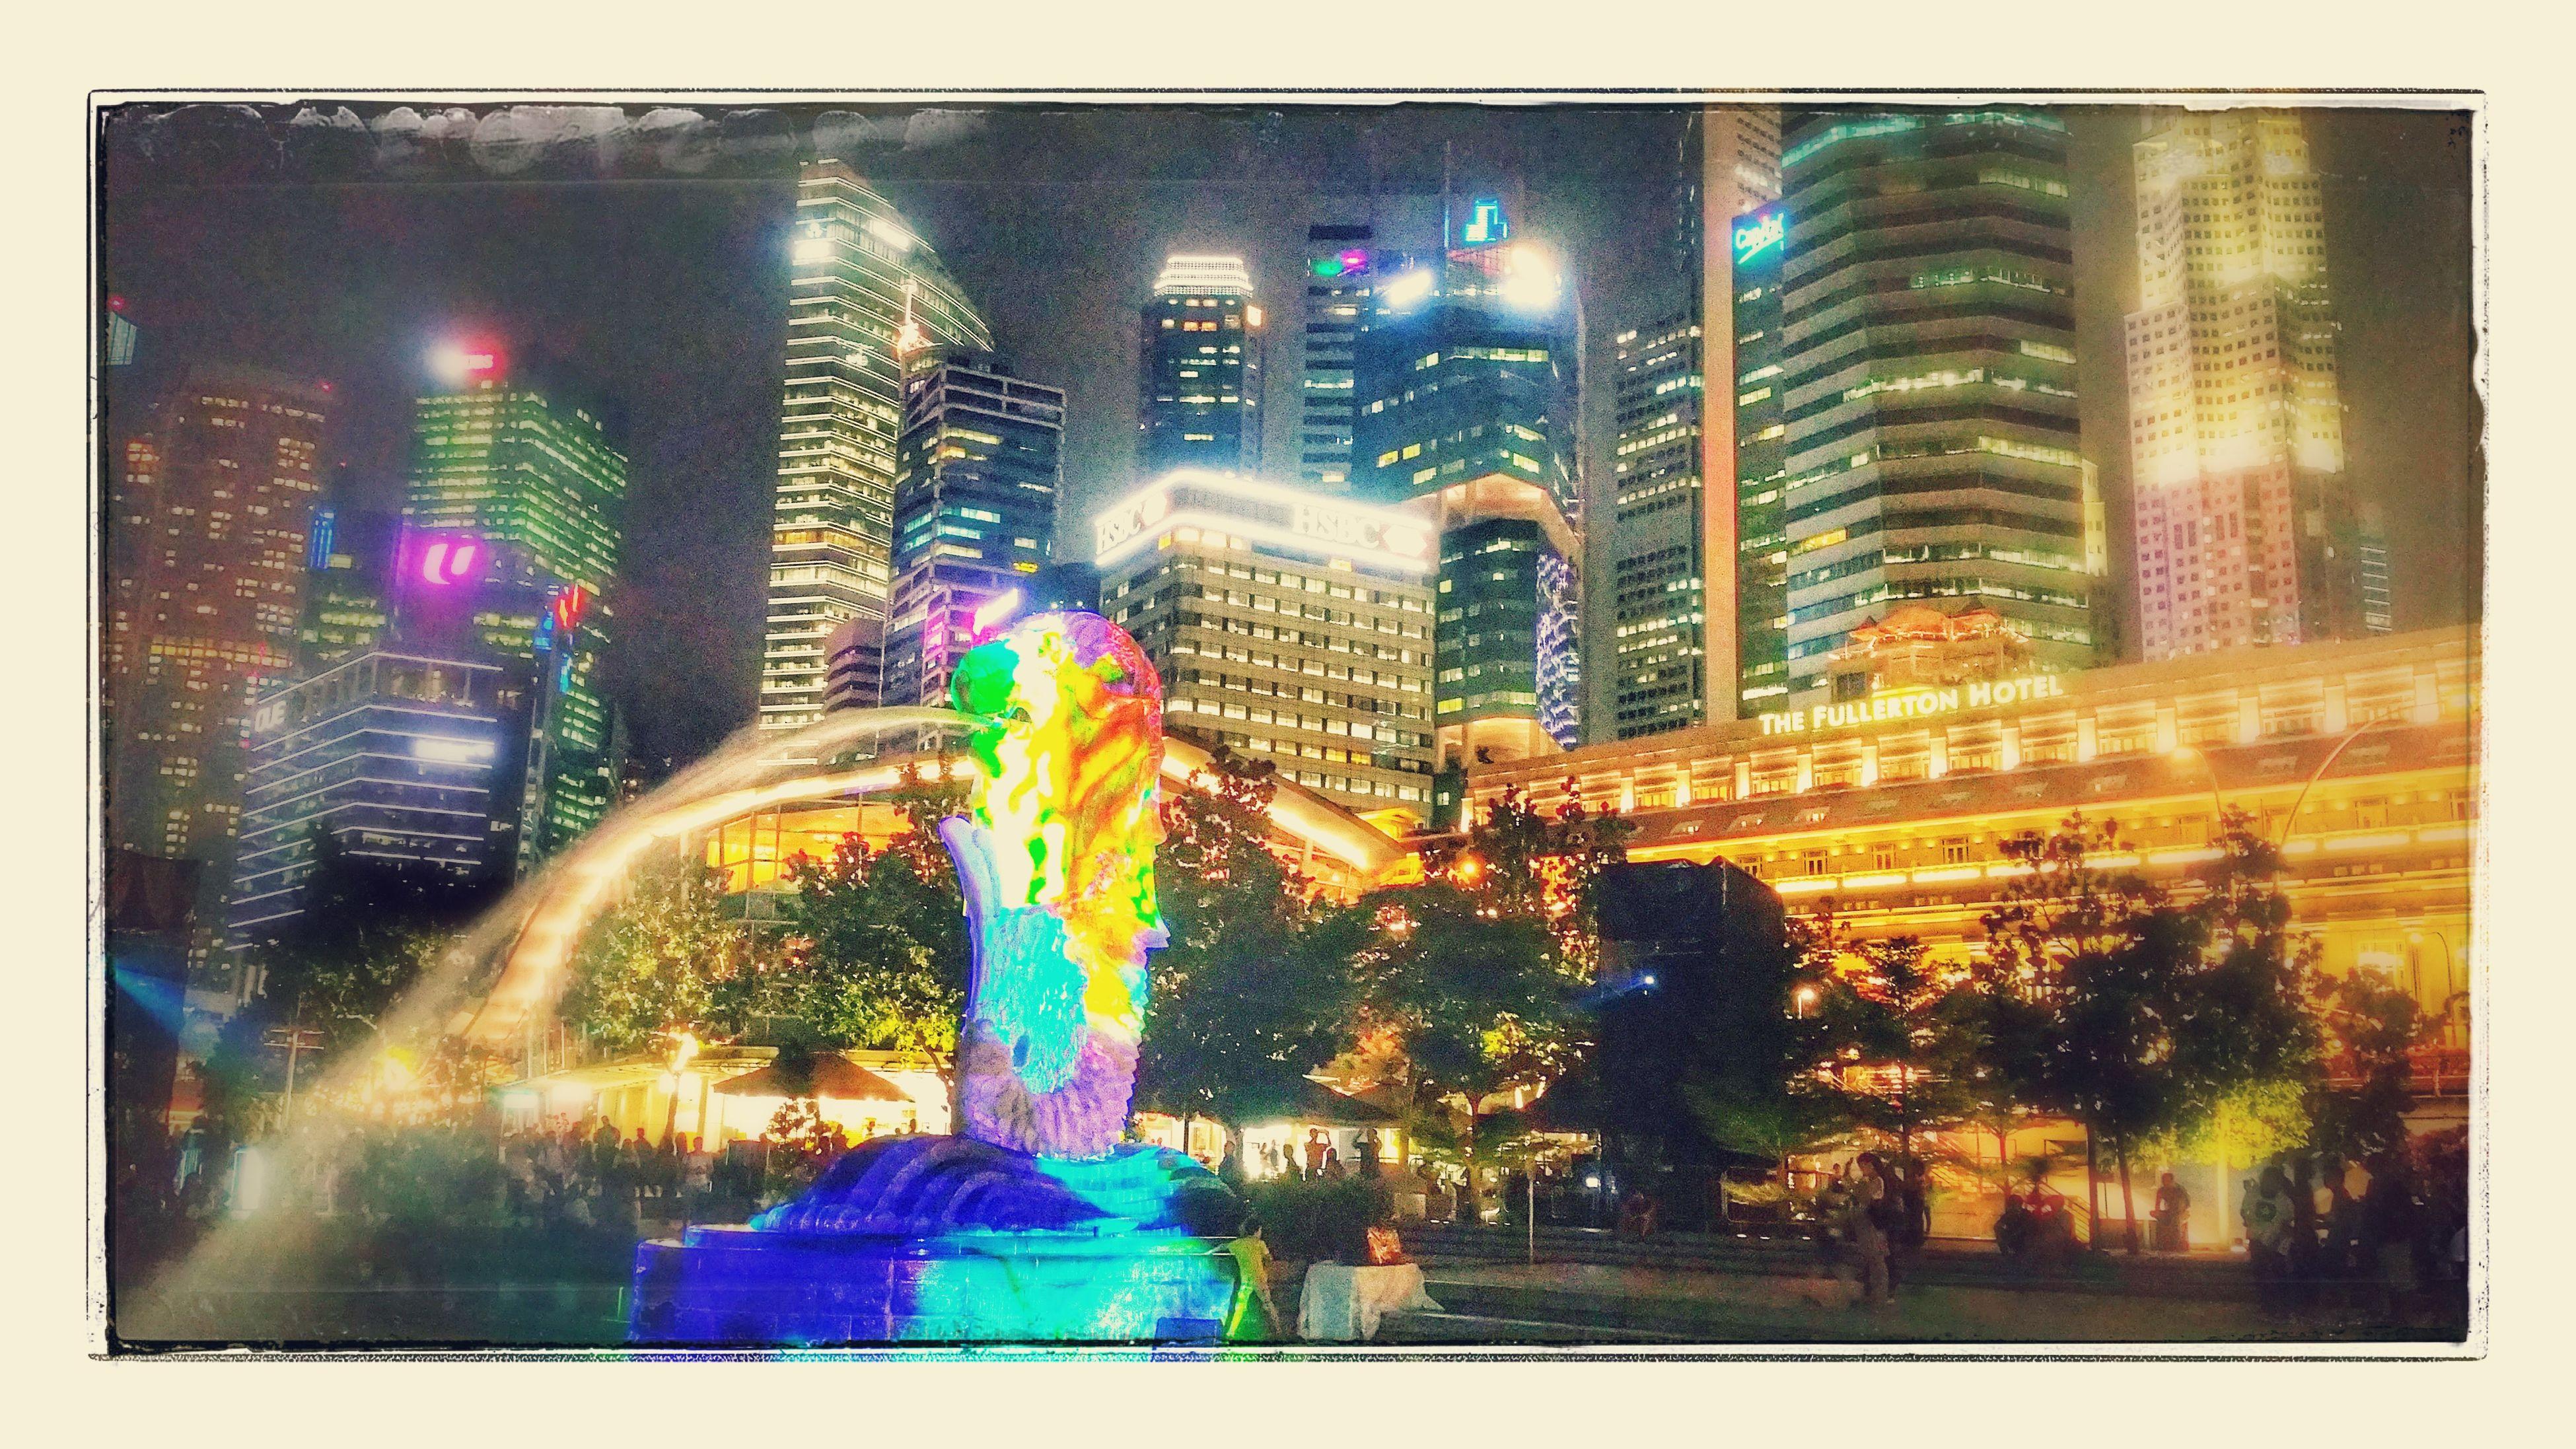 illuminated, no people, skyscraper, technology, architecture, urban skyline, outdoors, night